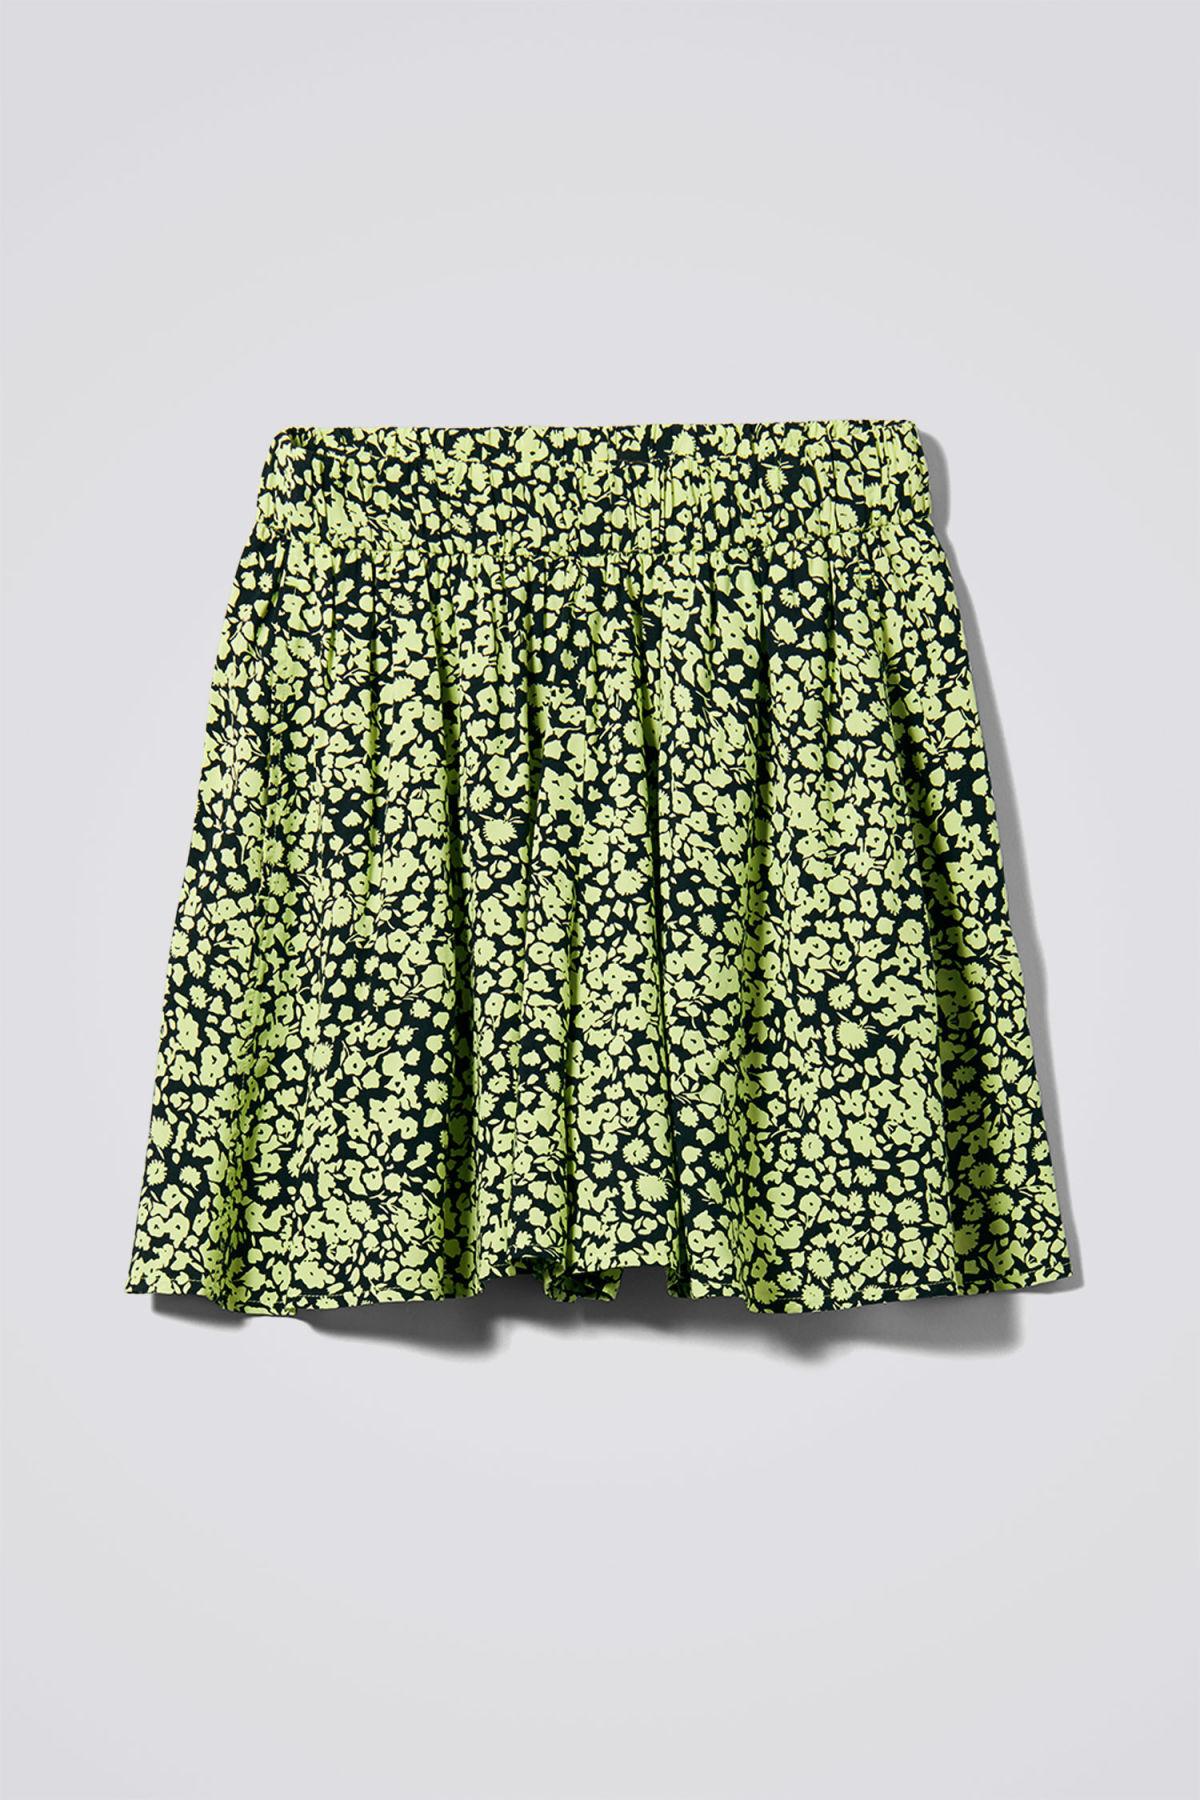 Image of Litz Shorts - Yellow-40